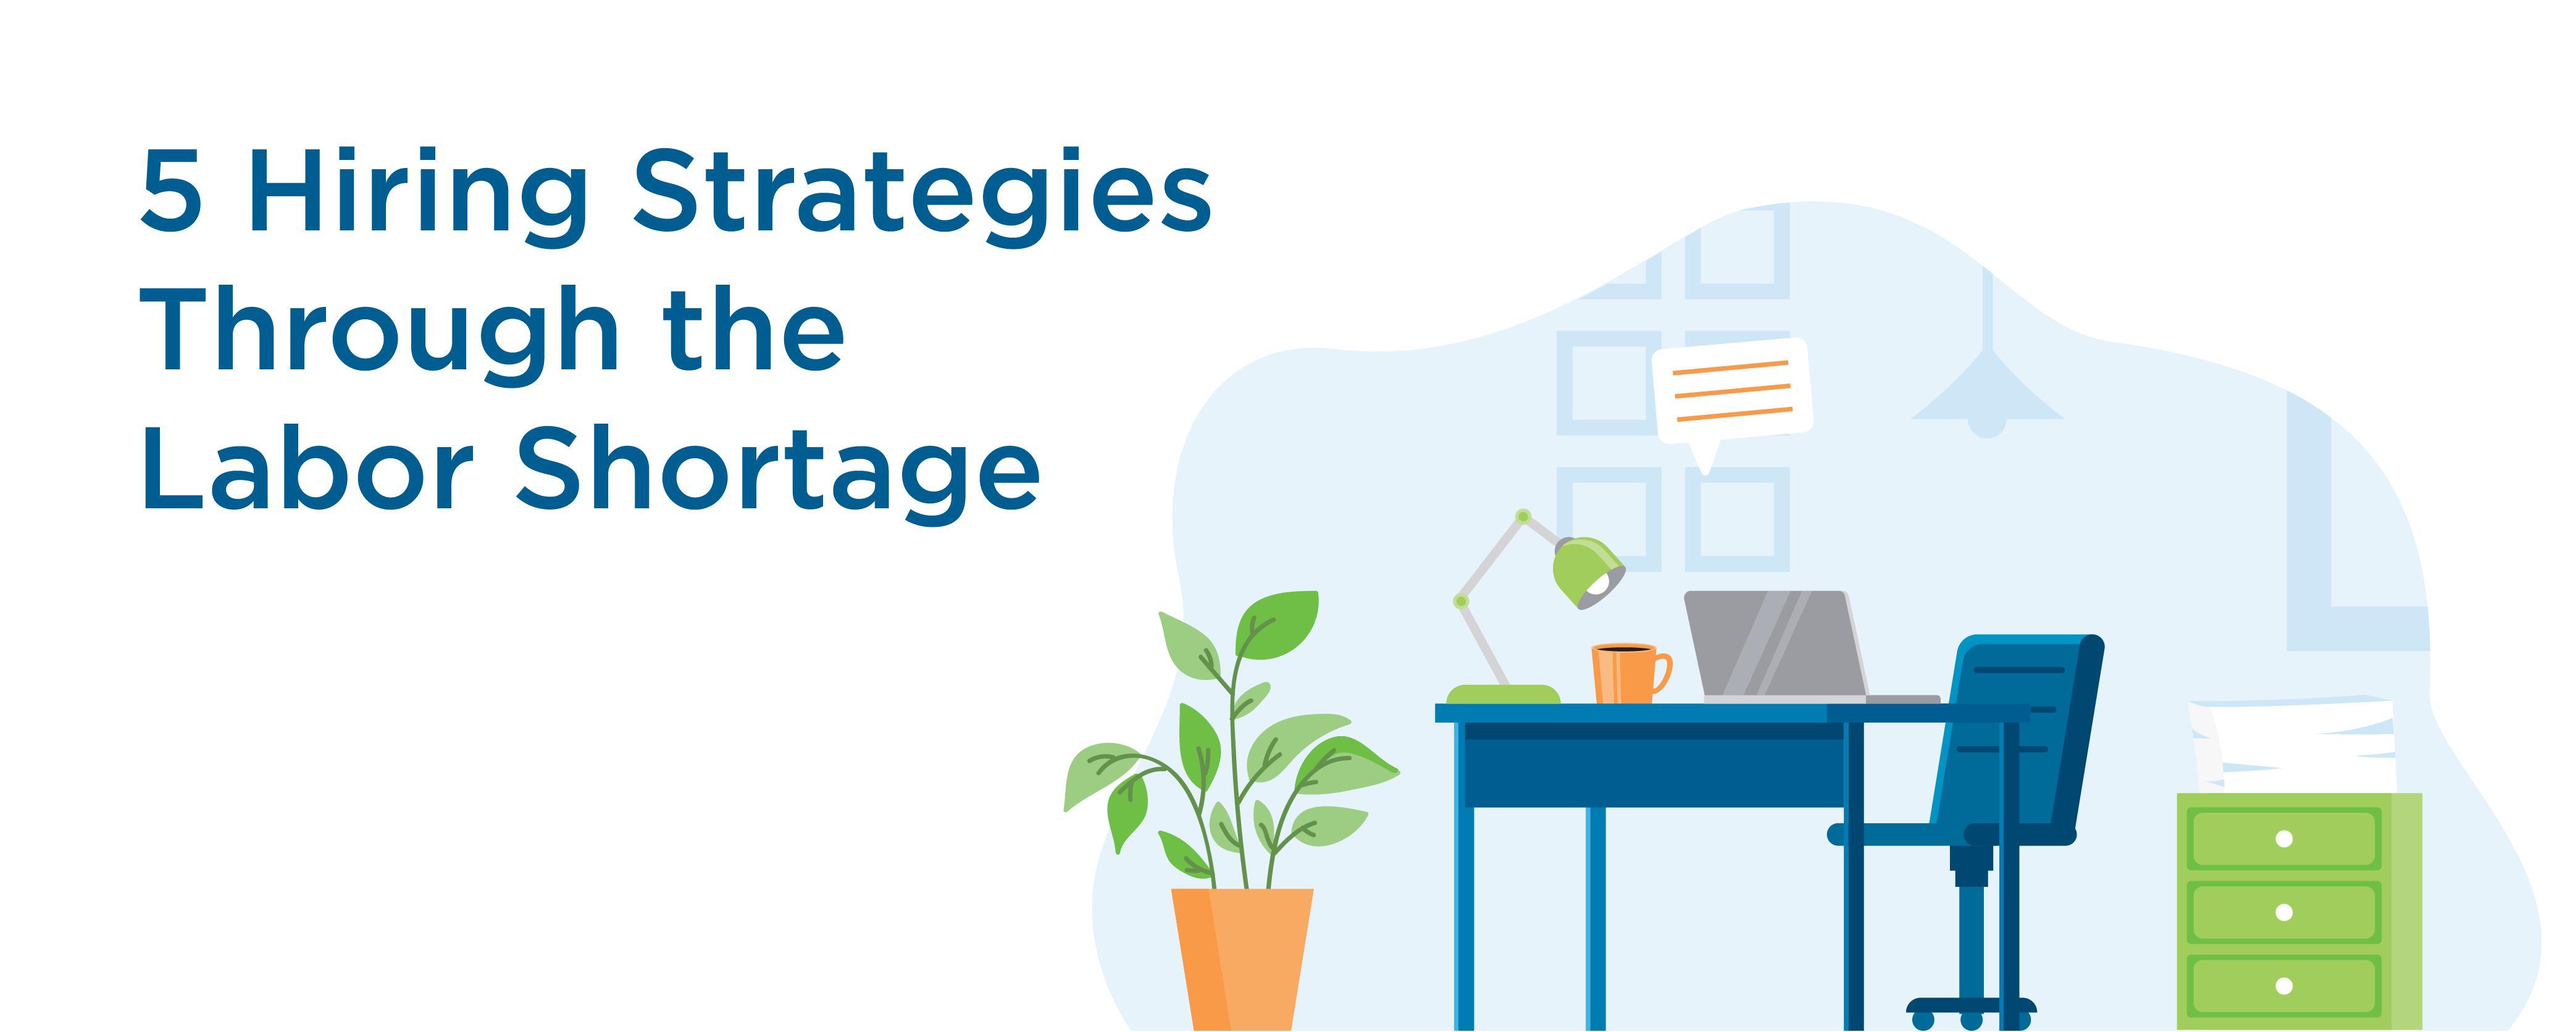 5 Hiring Strategies Through the Labor Shortage